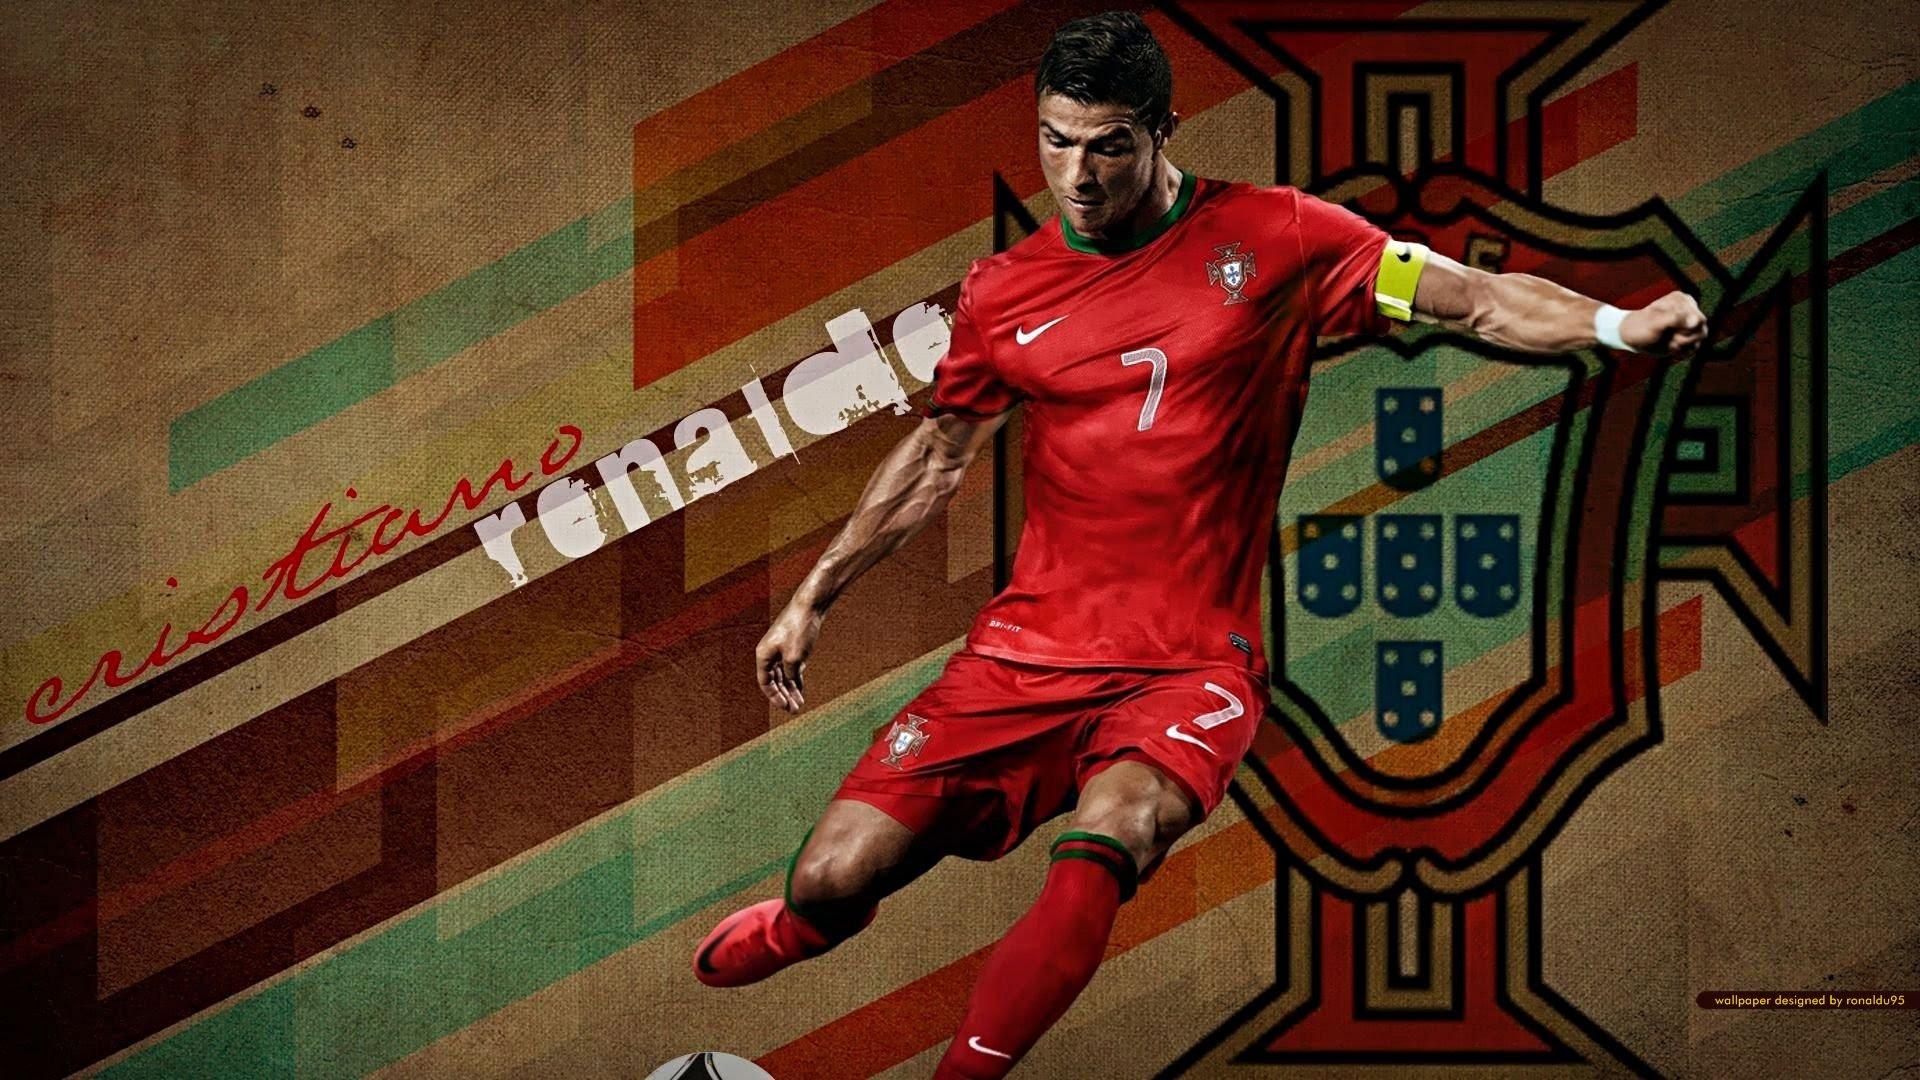 PORTUGAL soccer (46) wallpaper | 1920x1080 | 362419 | WallpaperUP